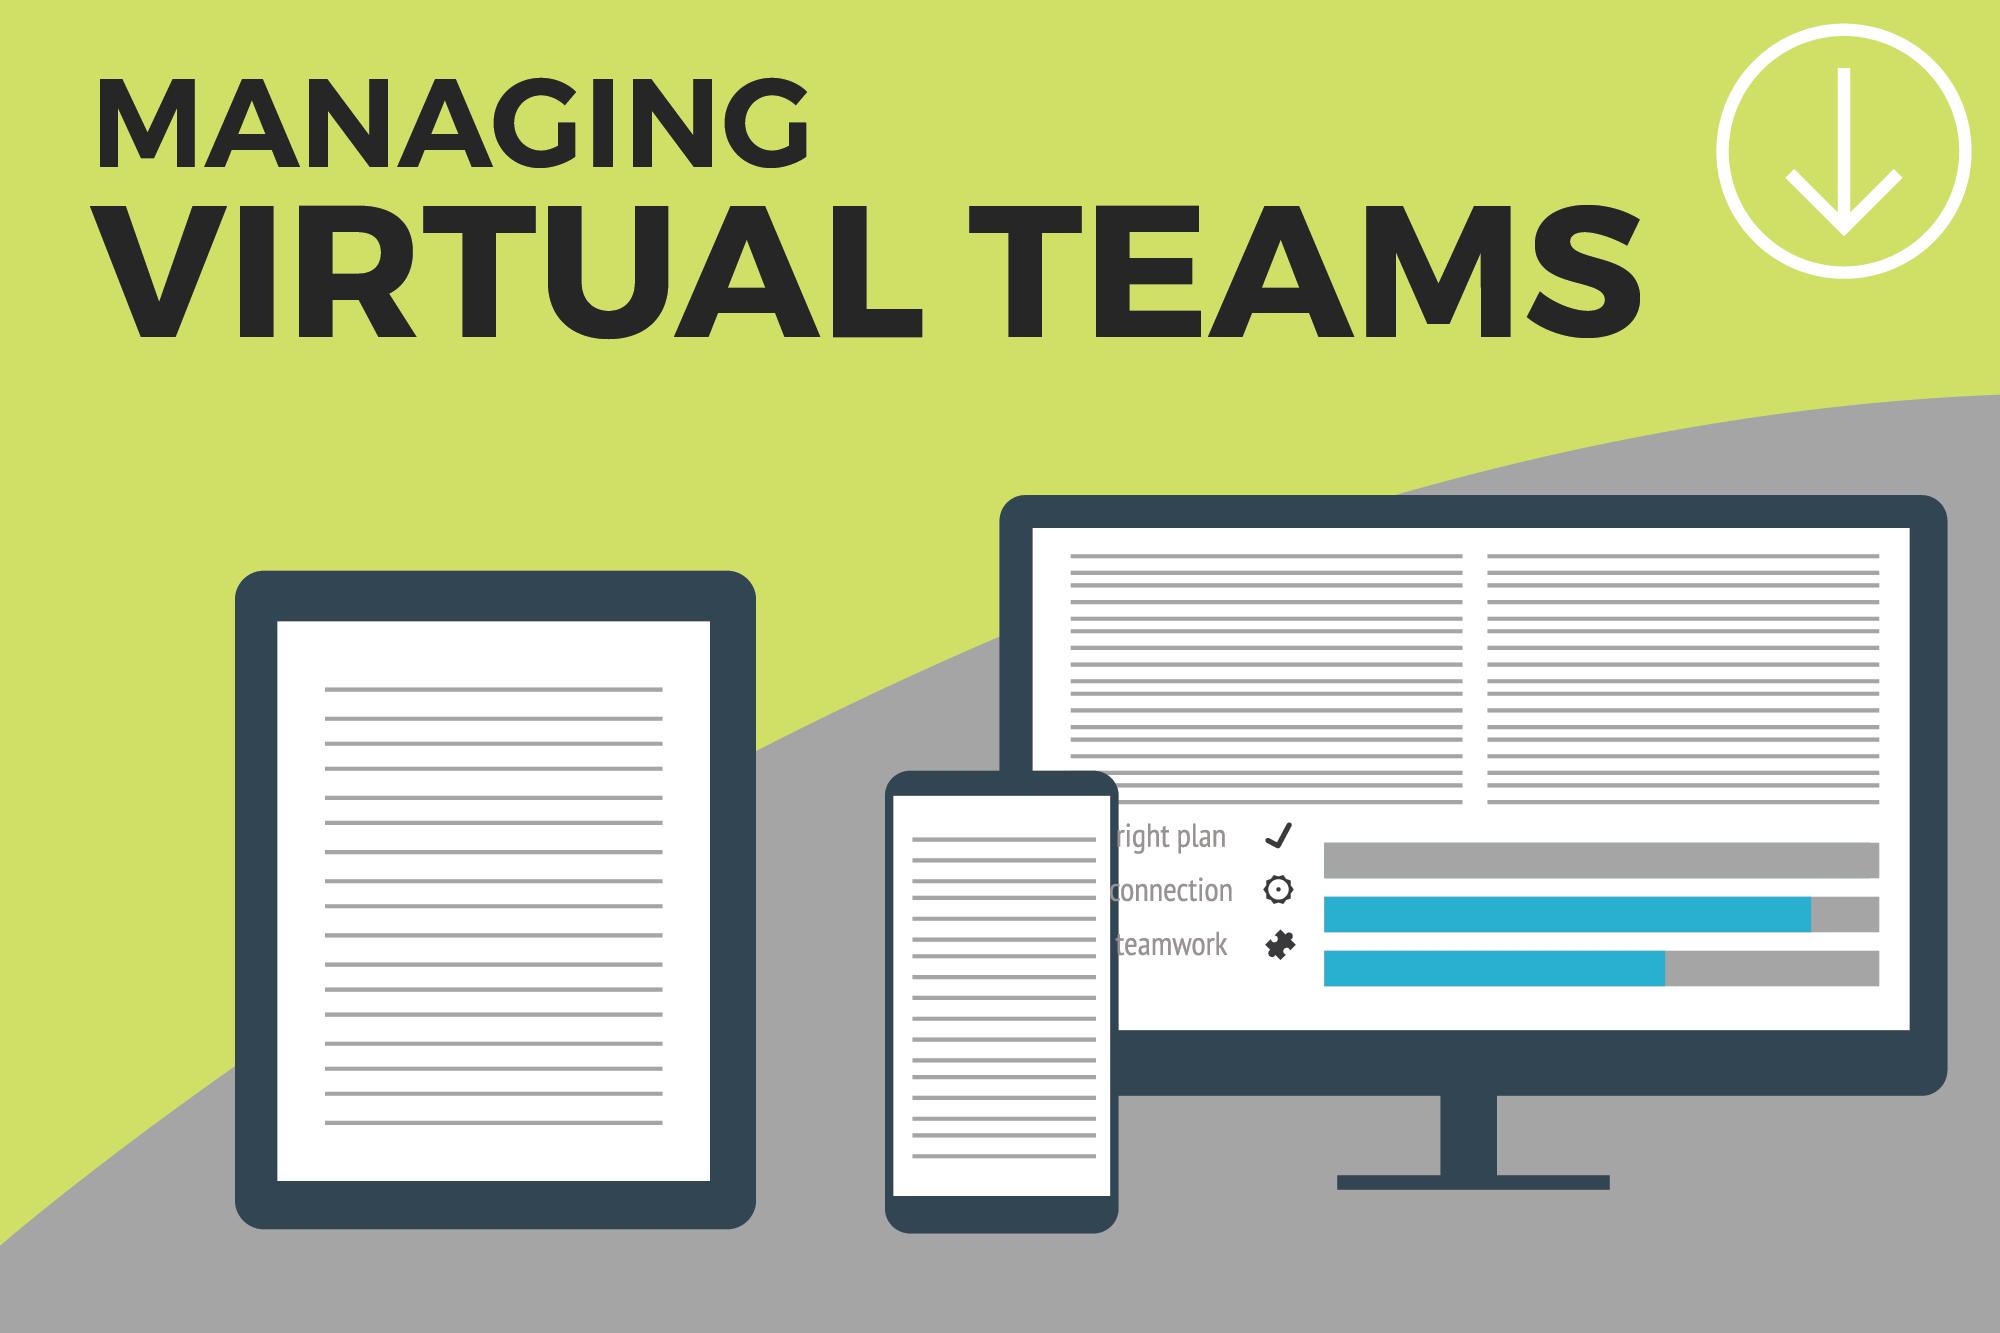 managing-virtual-teams-1.png